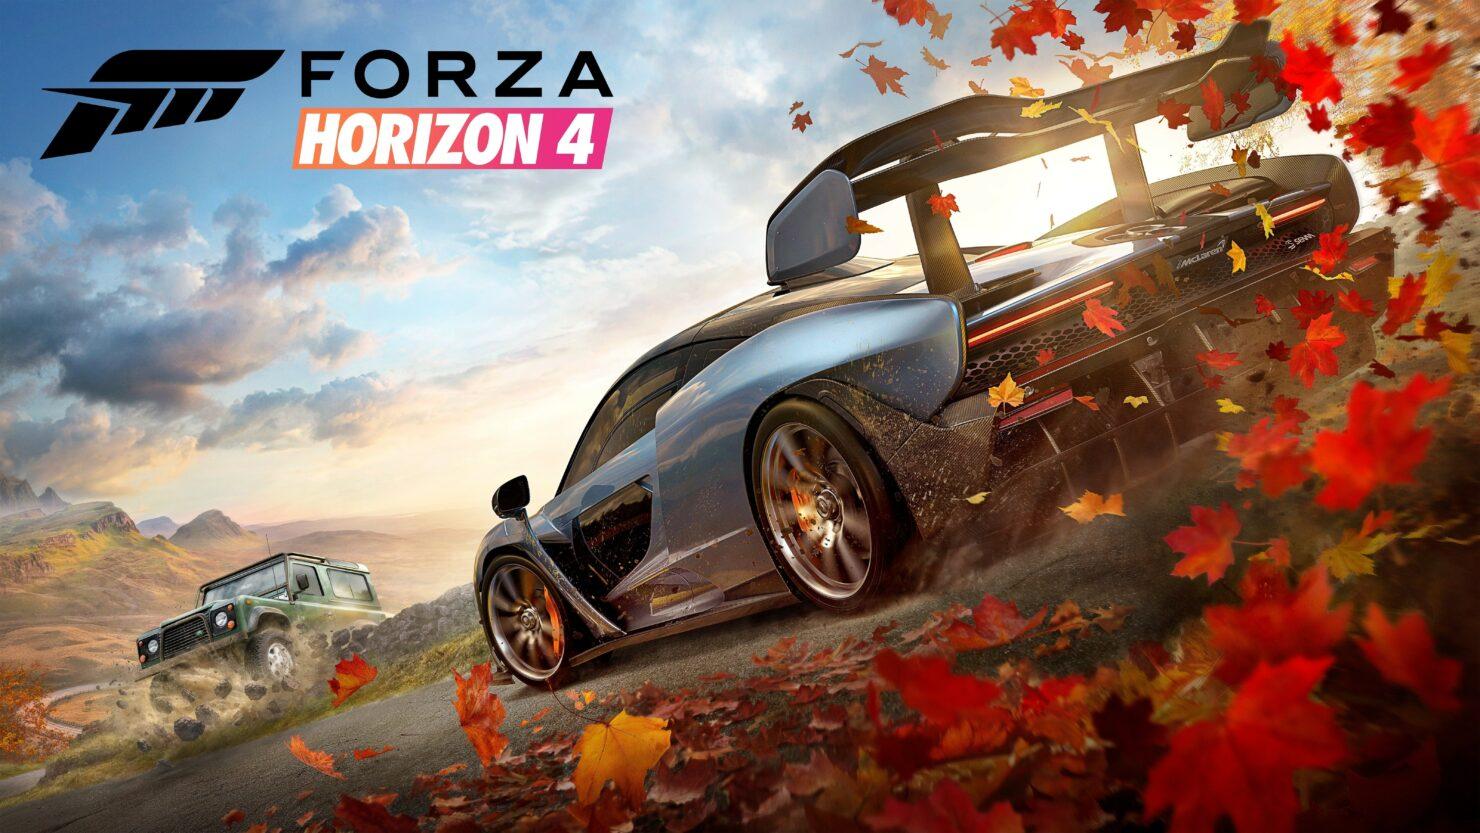 Forza Horizon 4 patch pc xbox november 20